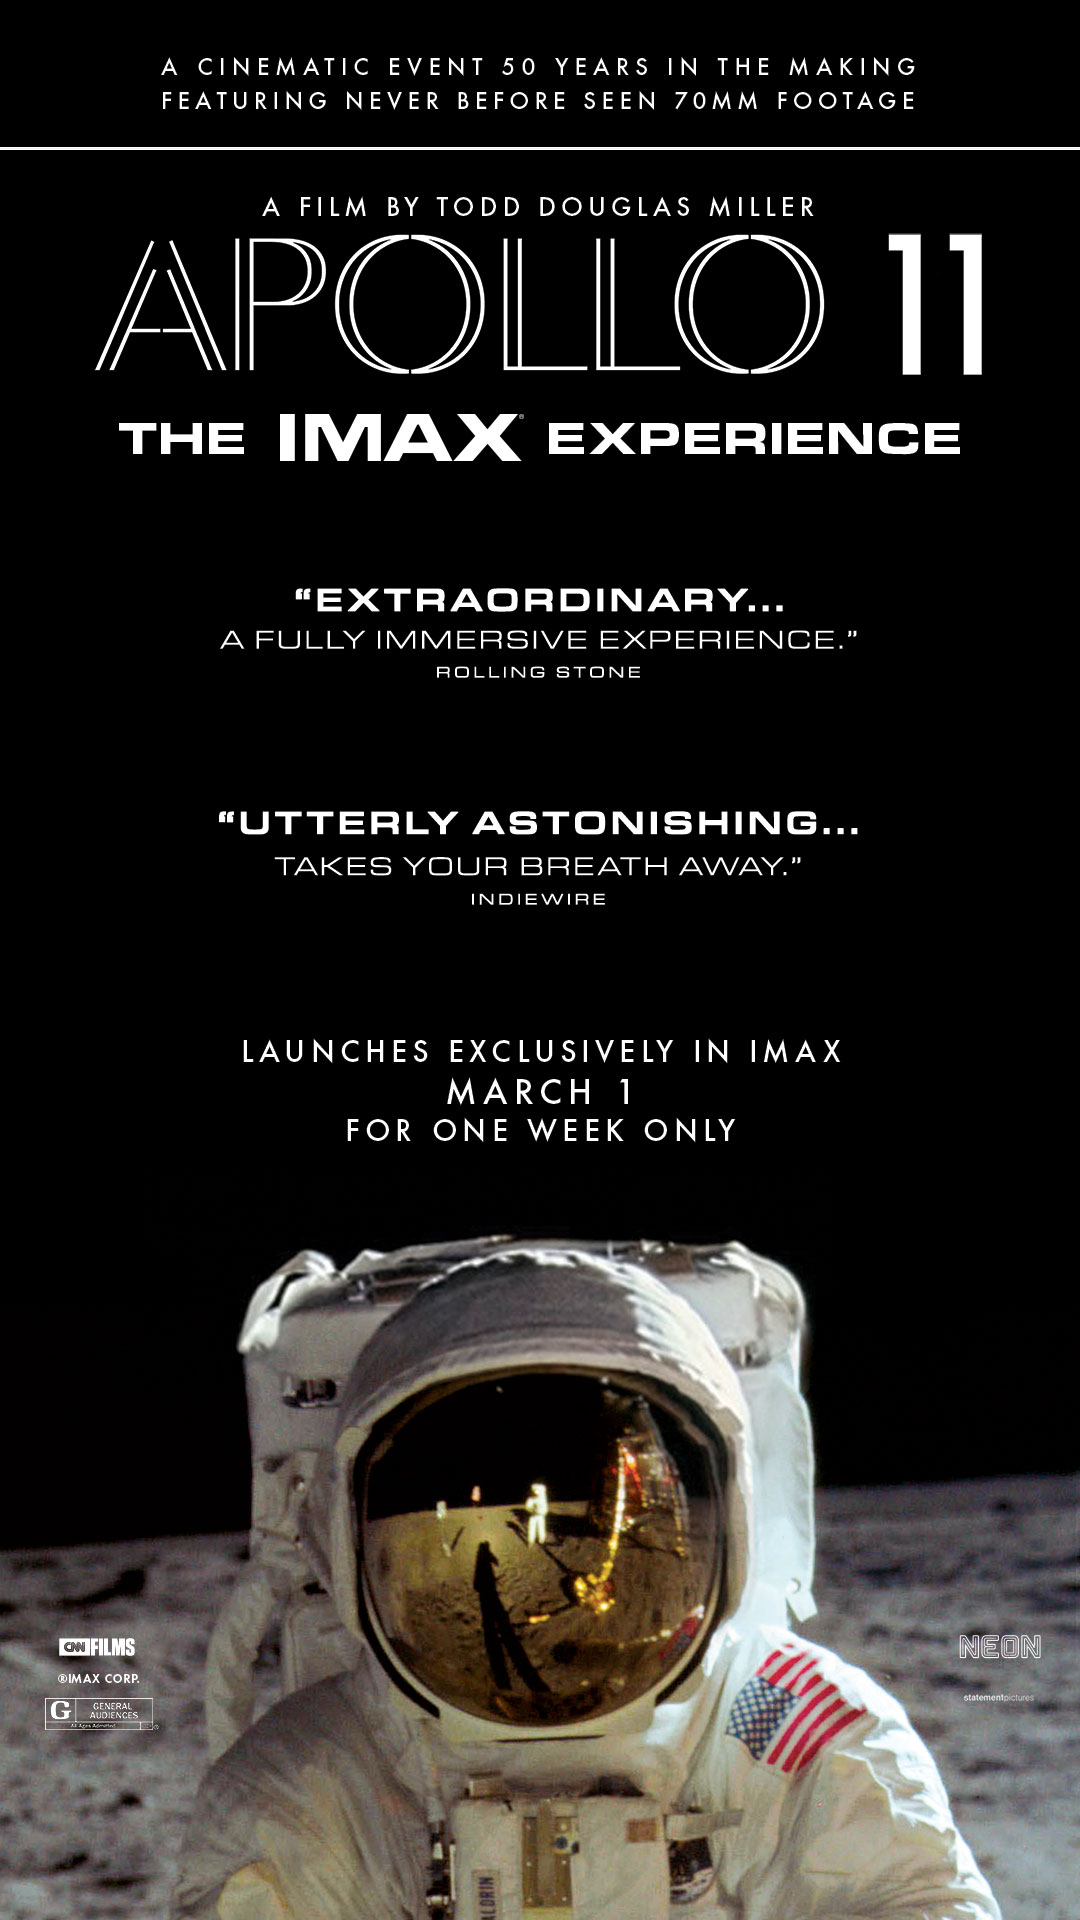 Apollo 11 | IMAX Poster